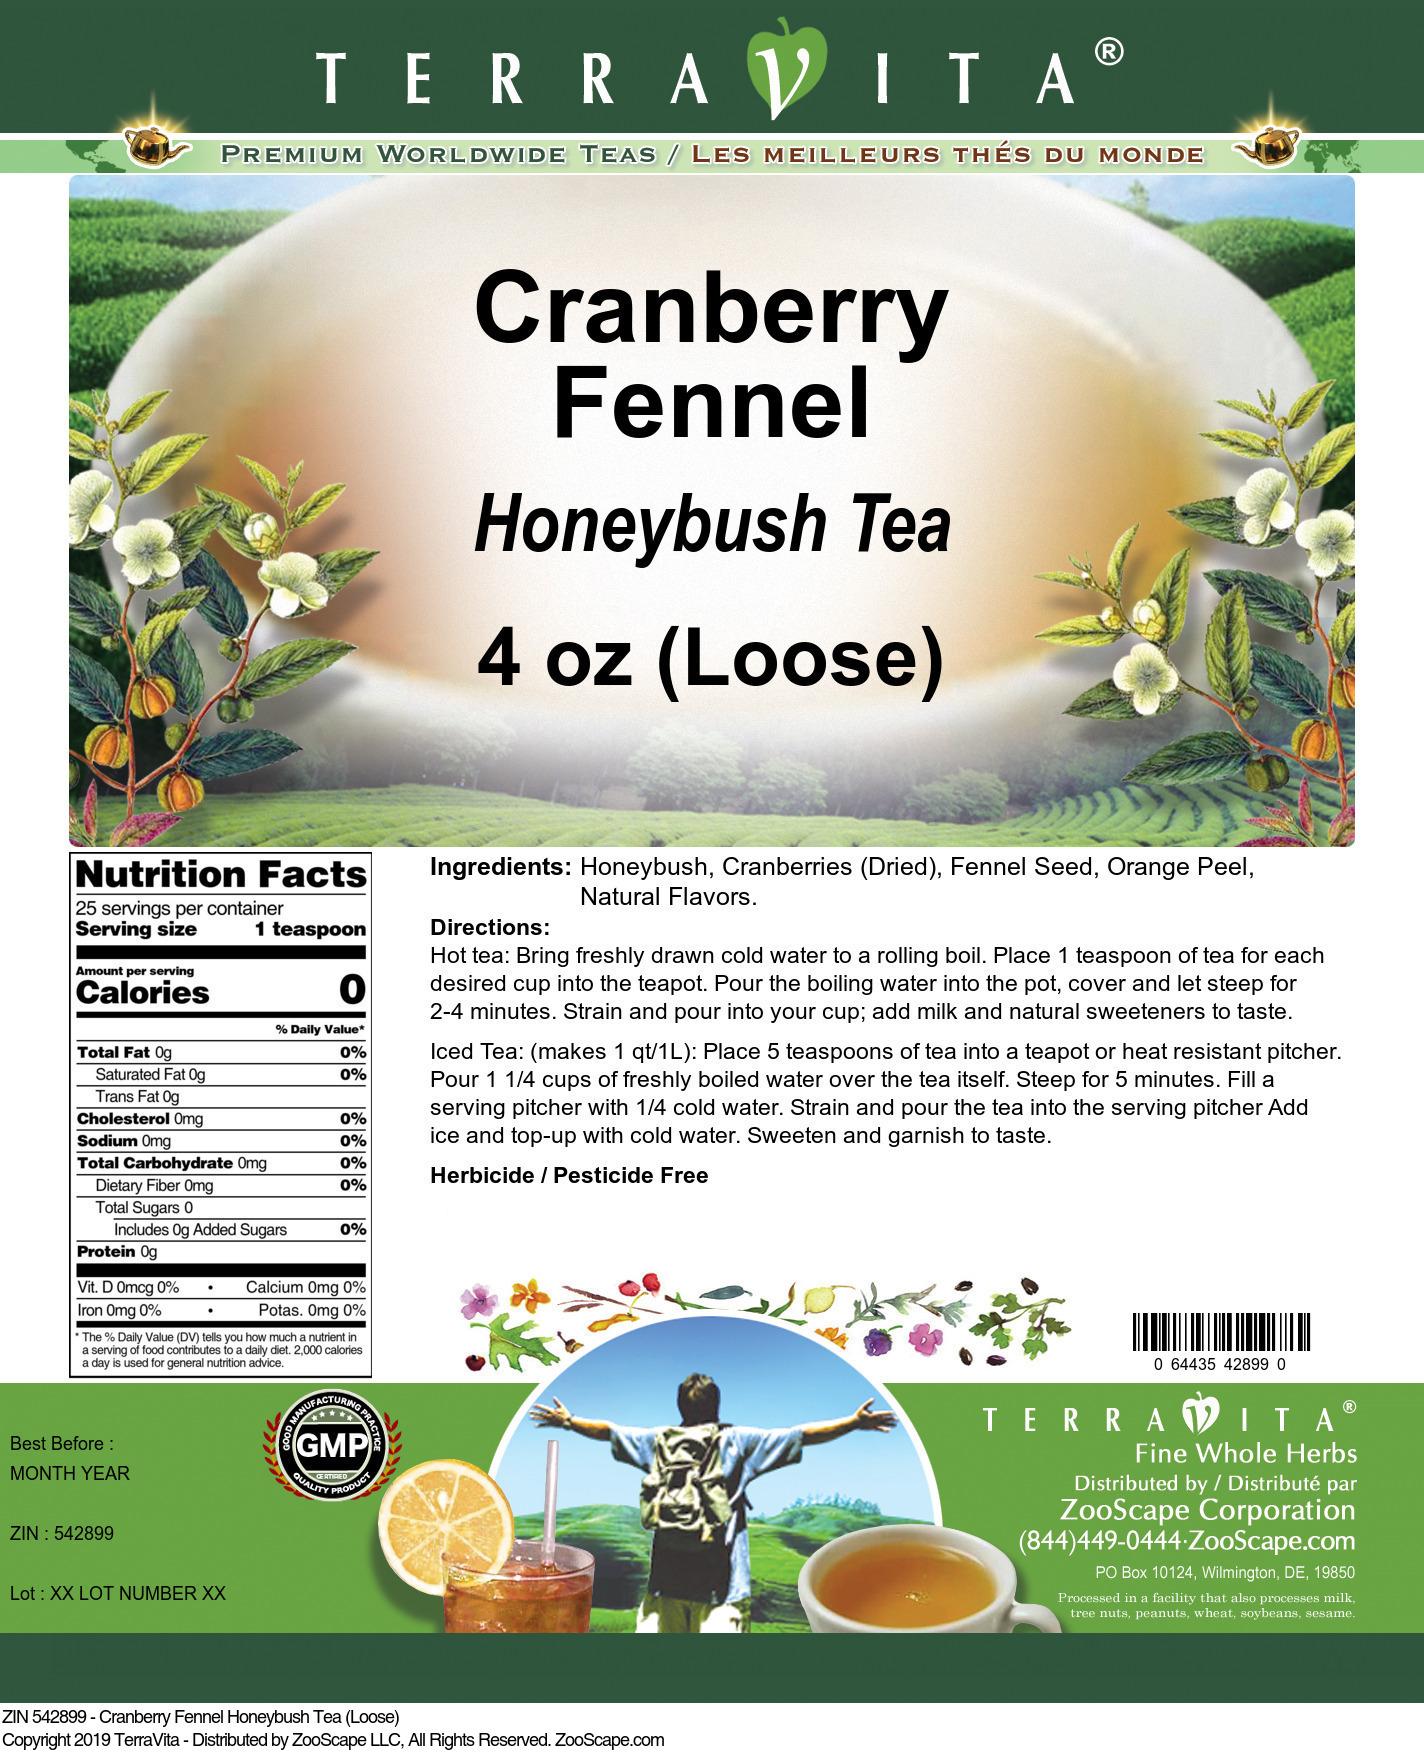 Cranberry Fennel Honeybush Tea (Loose)